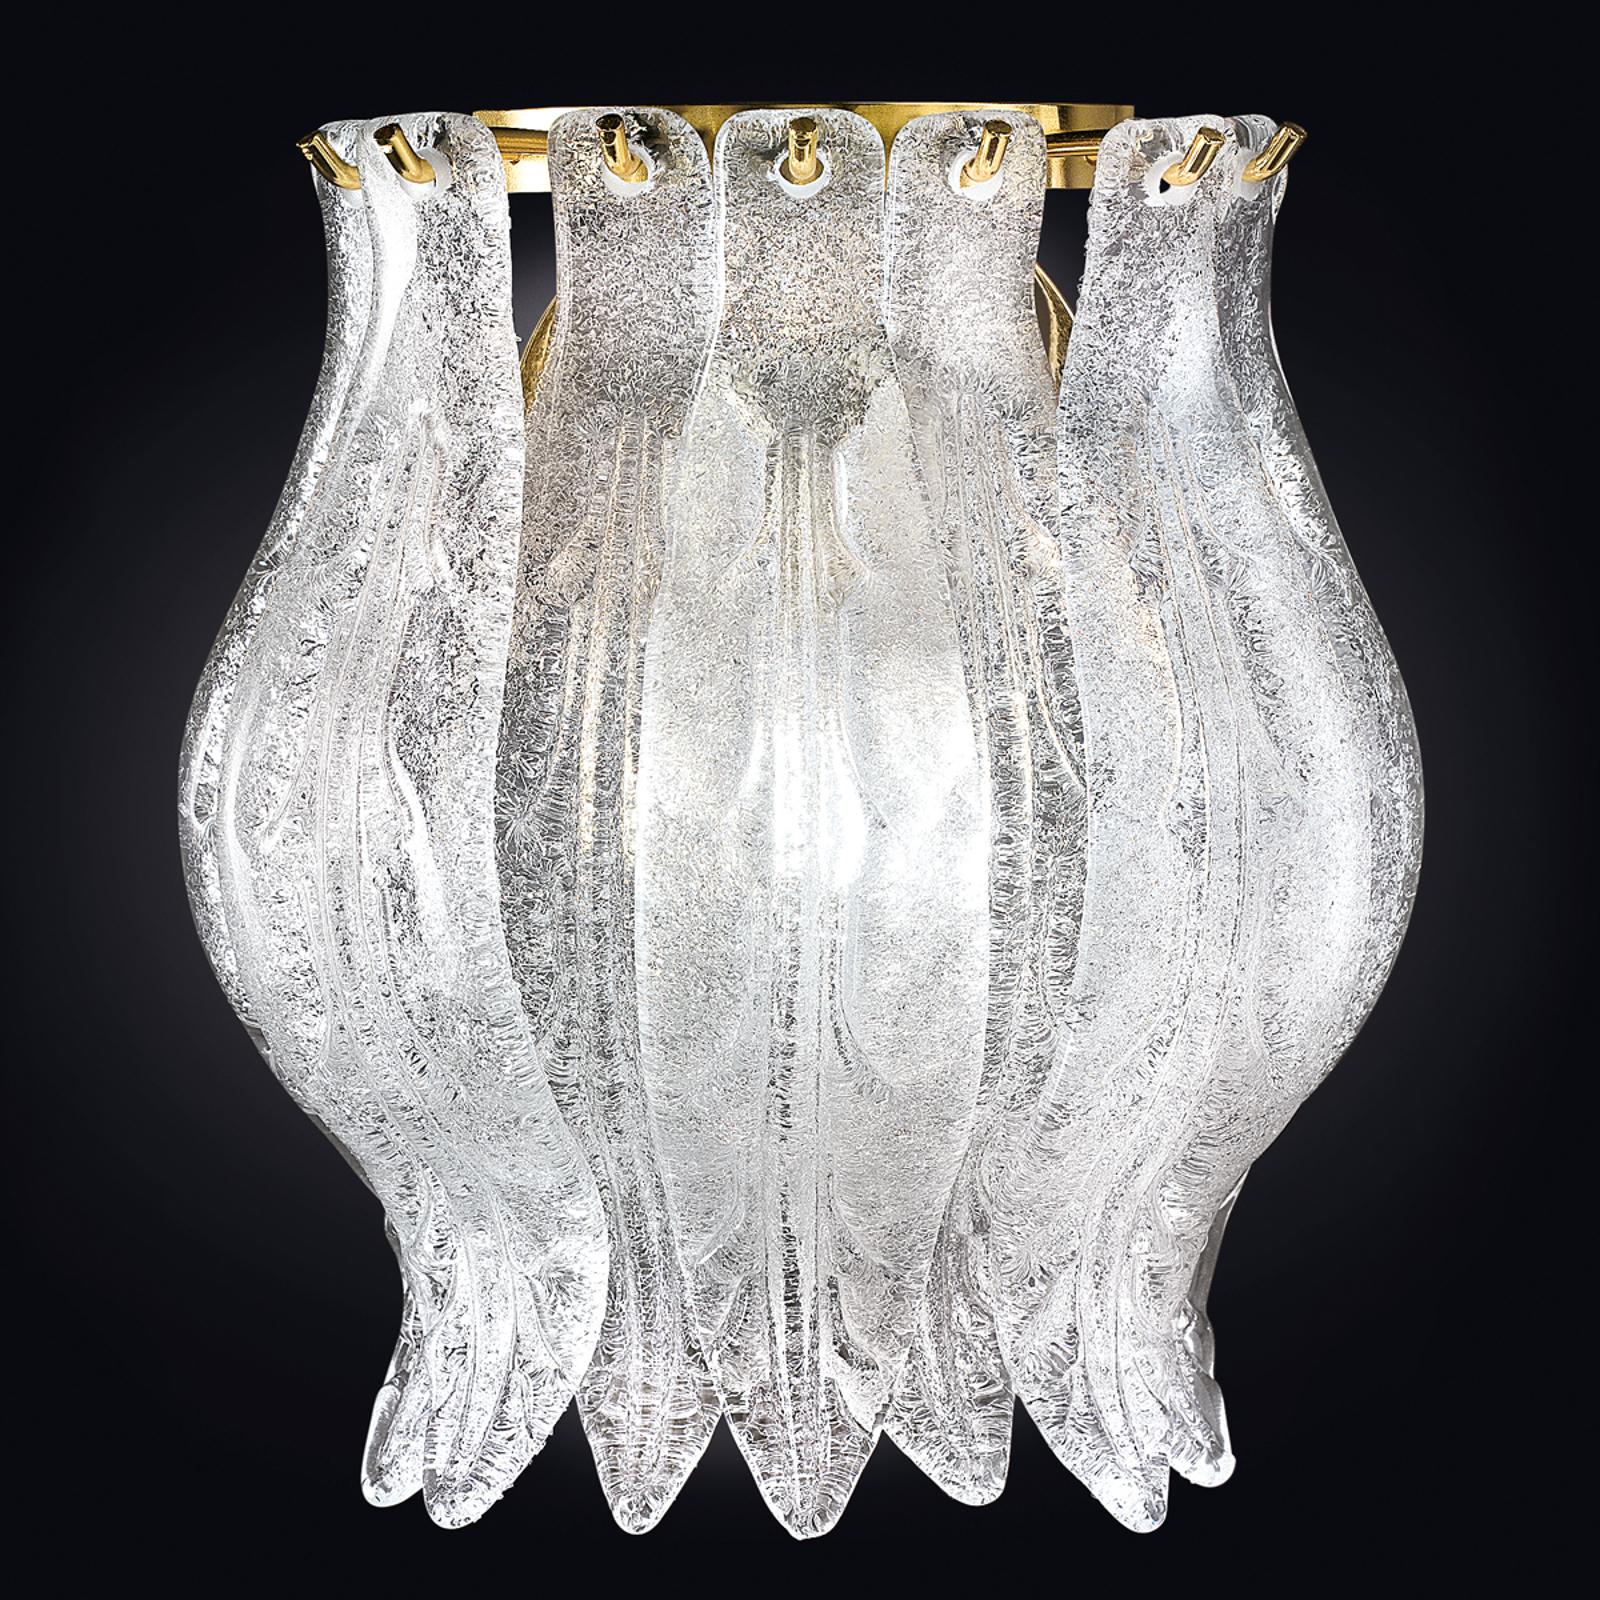 Petali vegglampe med Muranoglass 19 cm